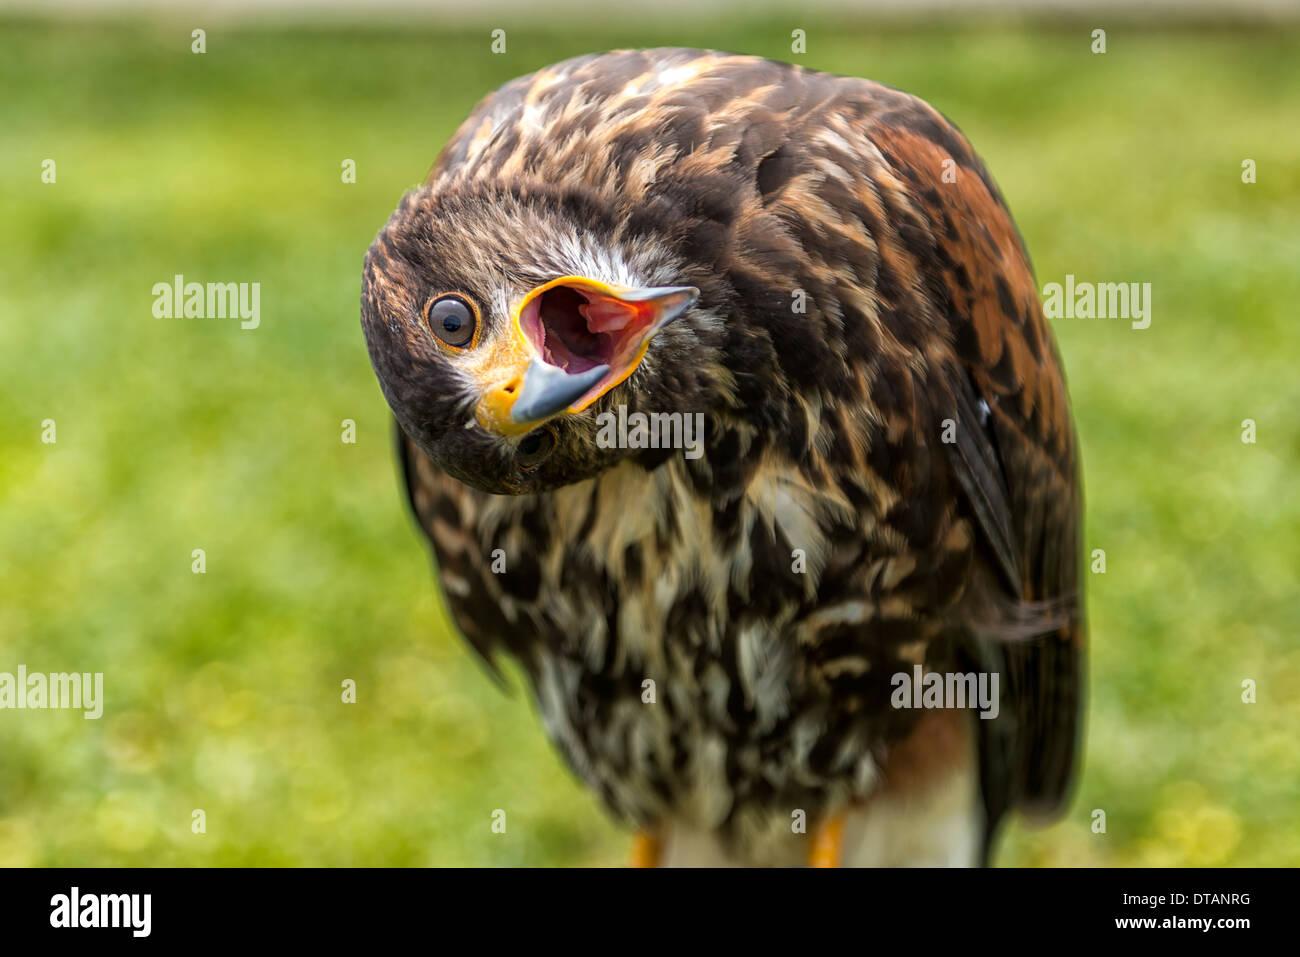 A juvenille Peregrine Falcon - Stock Image